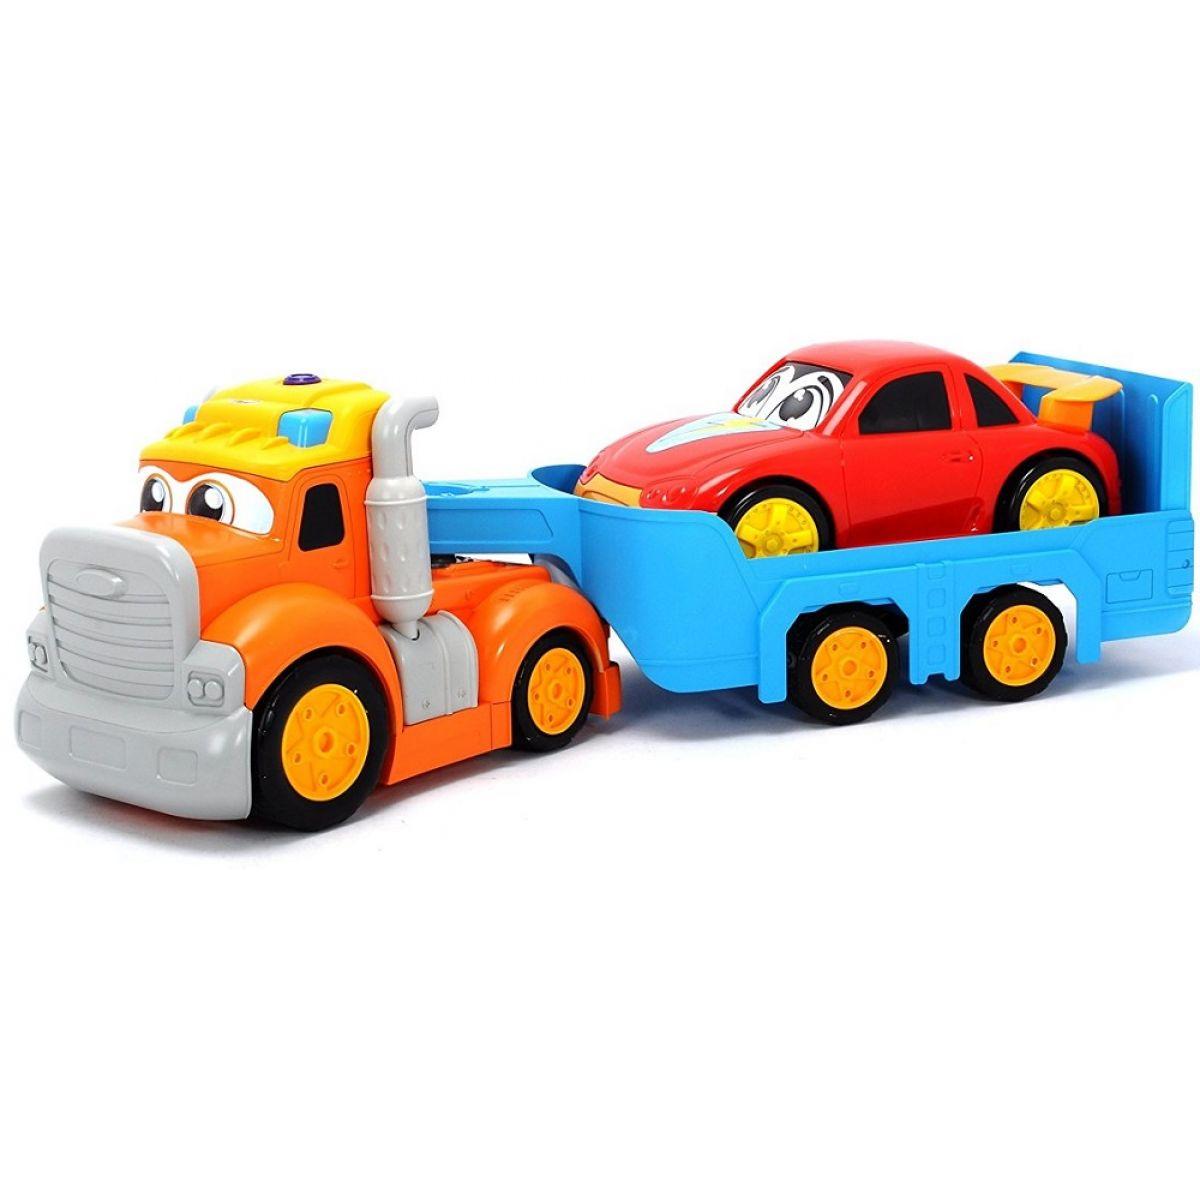 Dickie Transportér Happy Truck